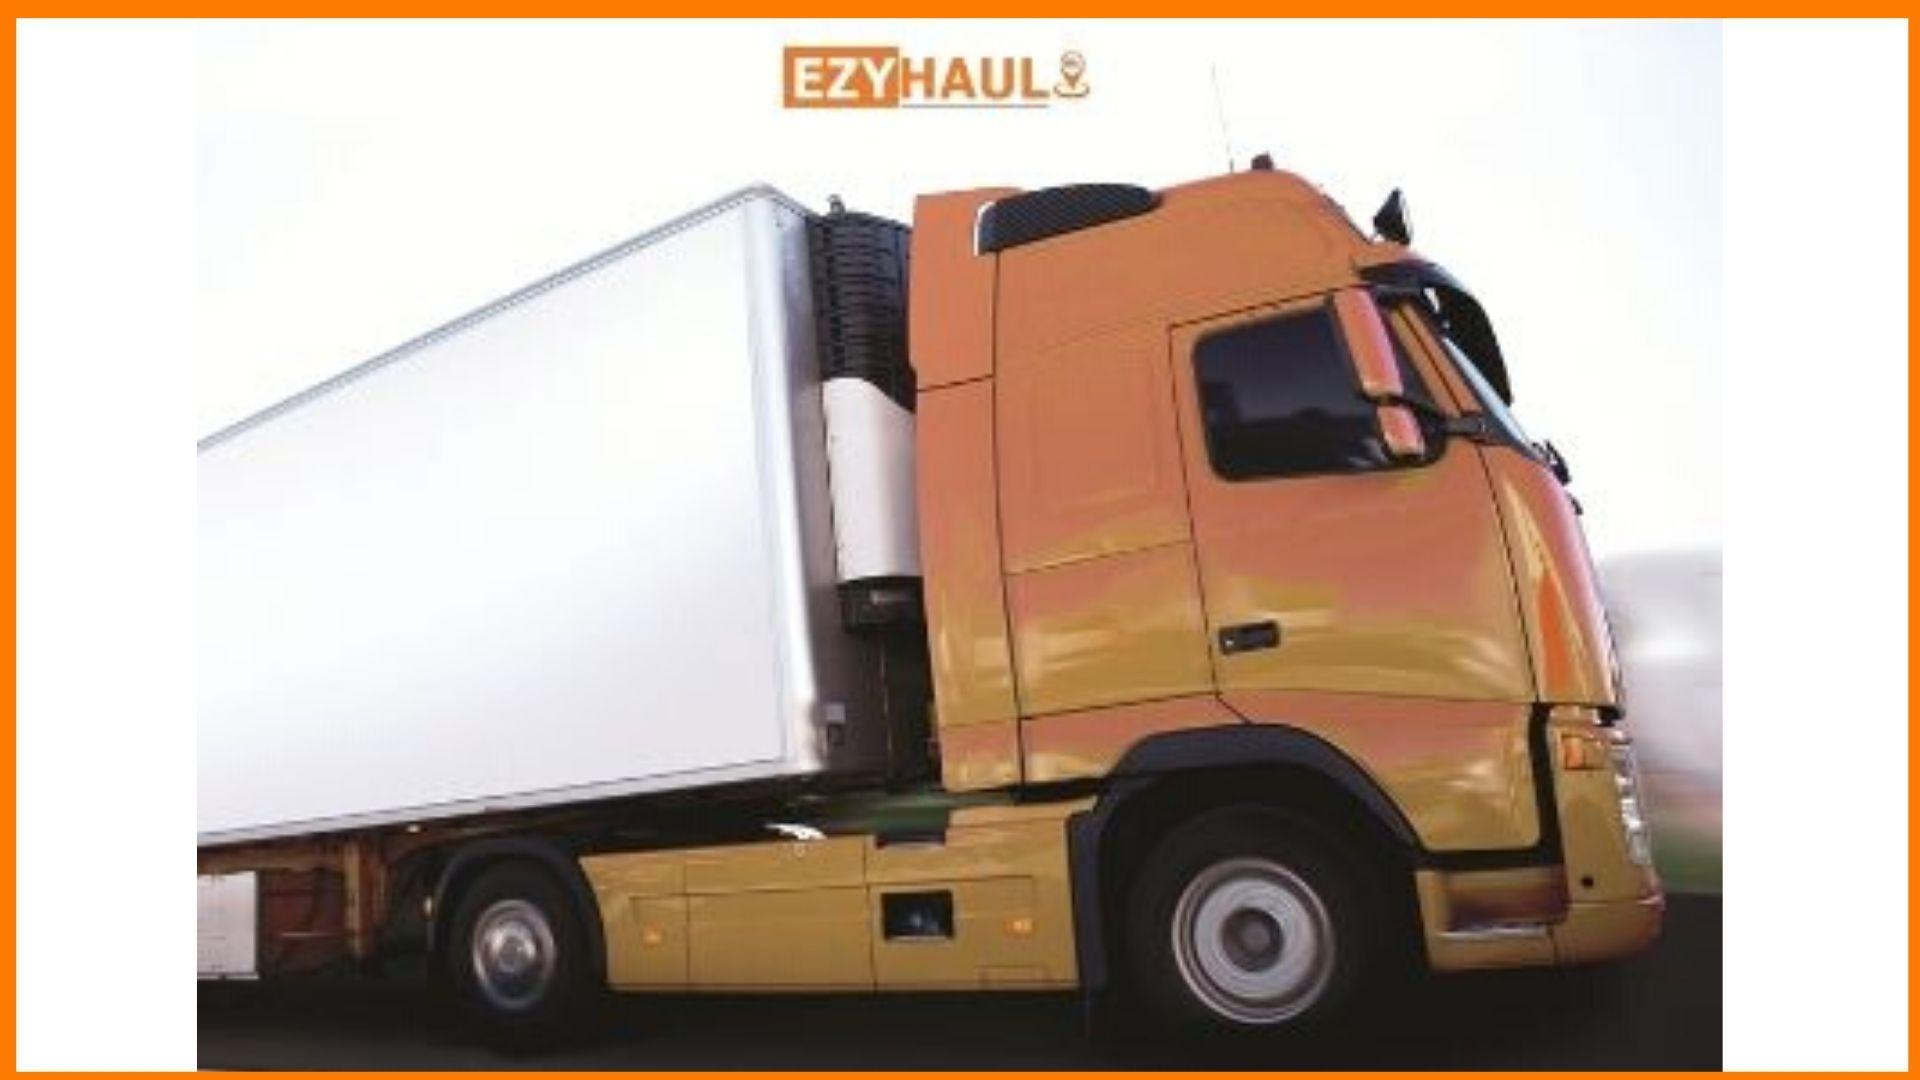 Ezyhaul Truck